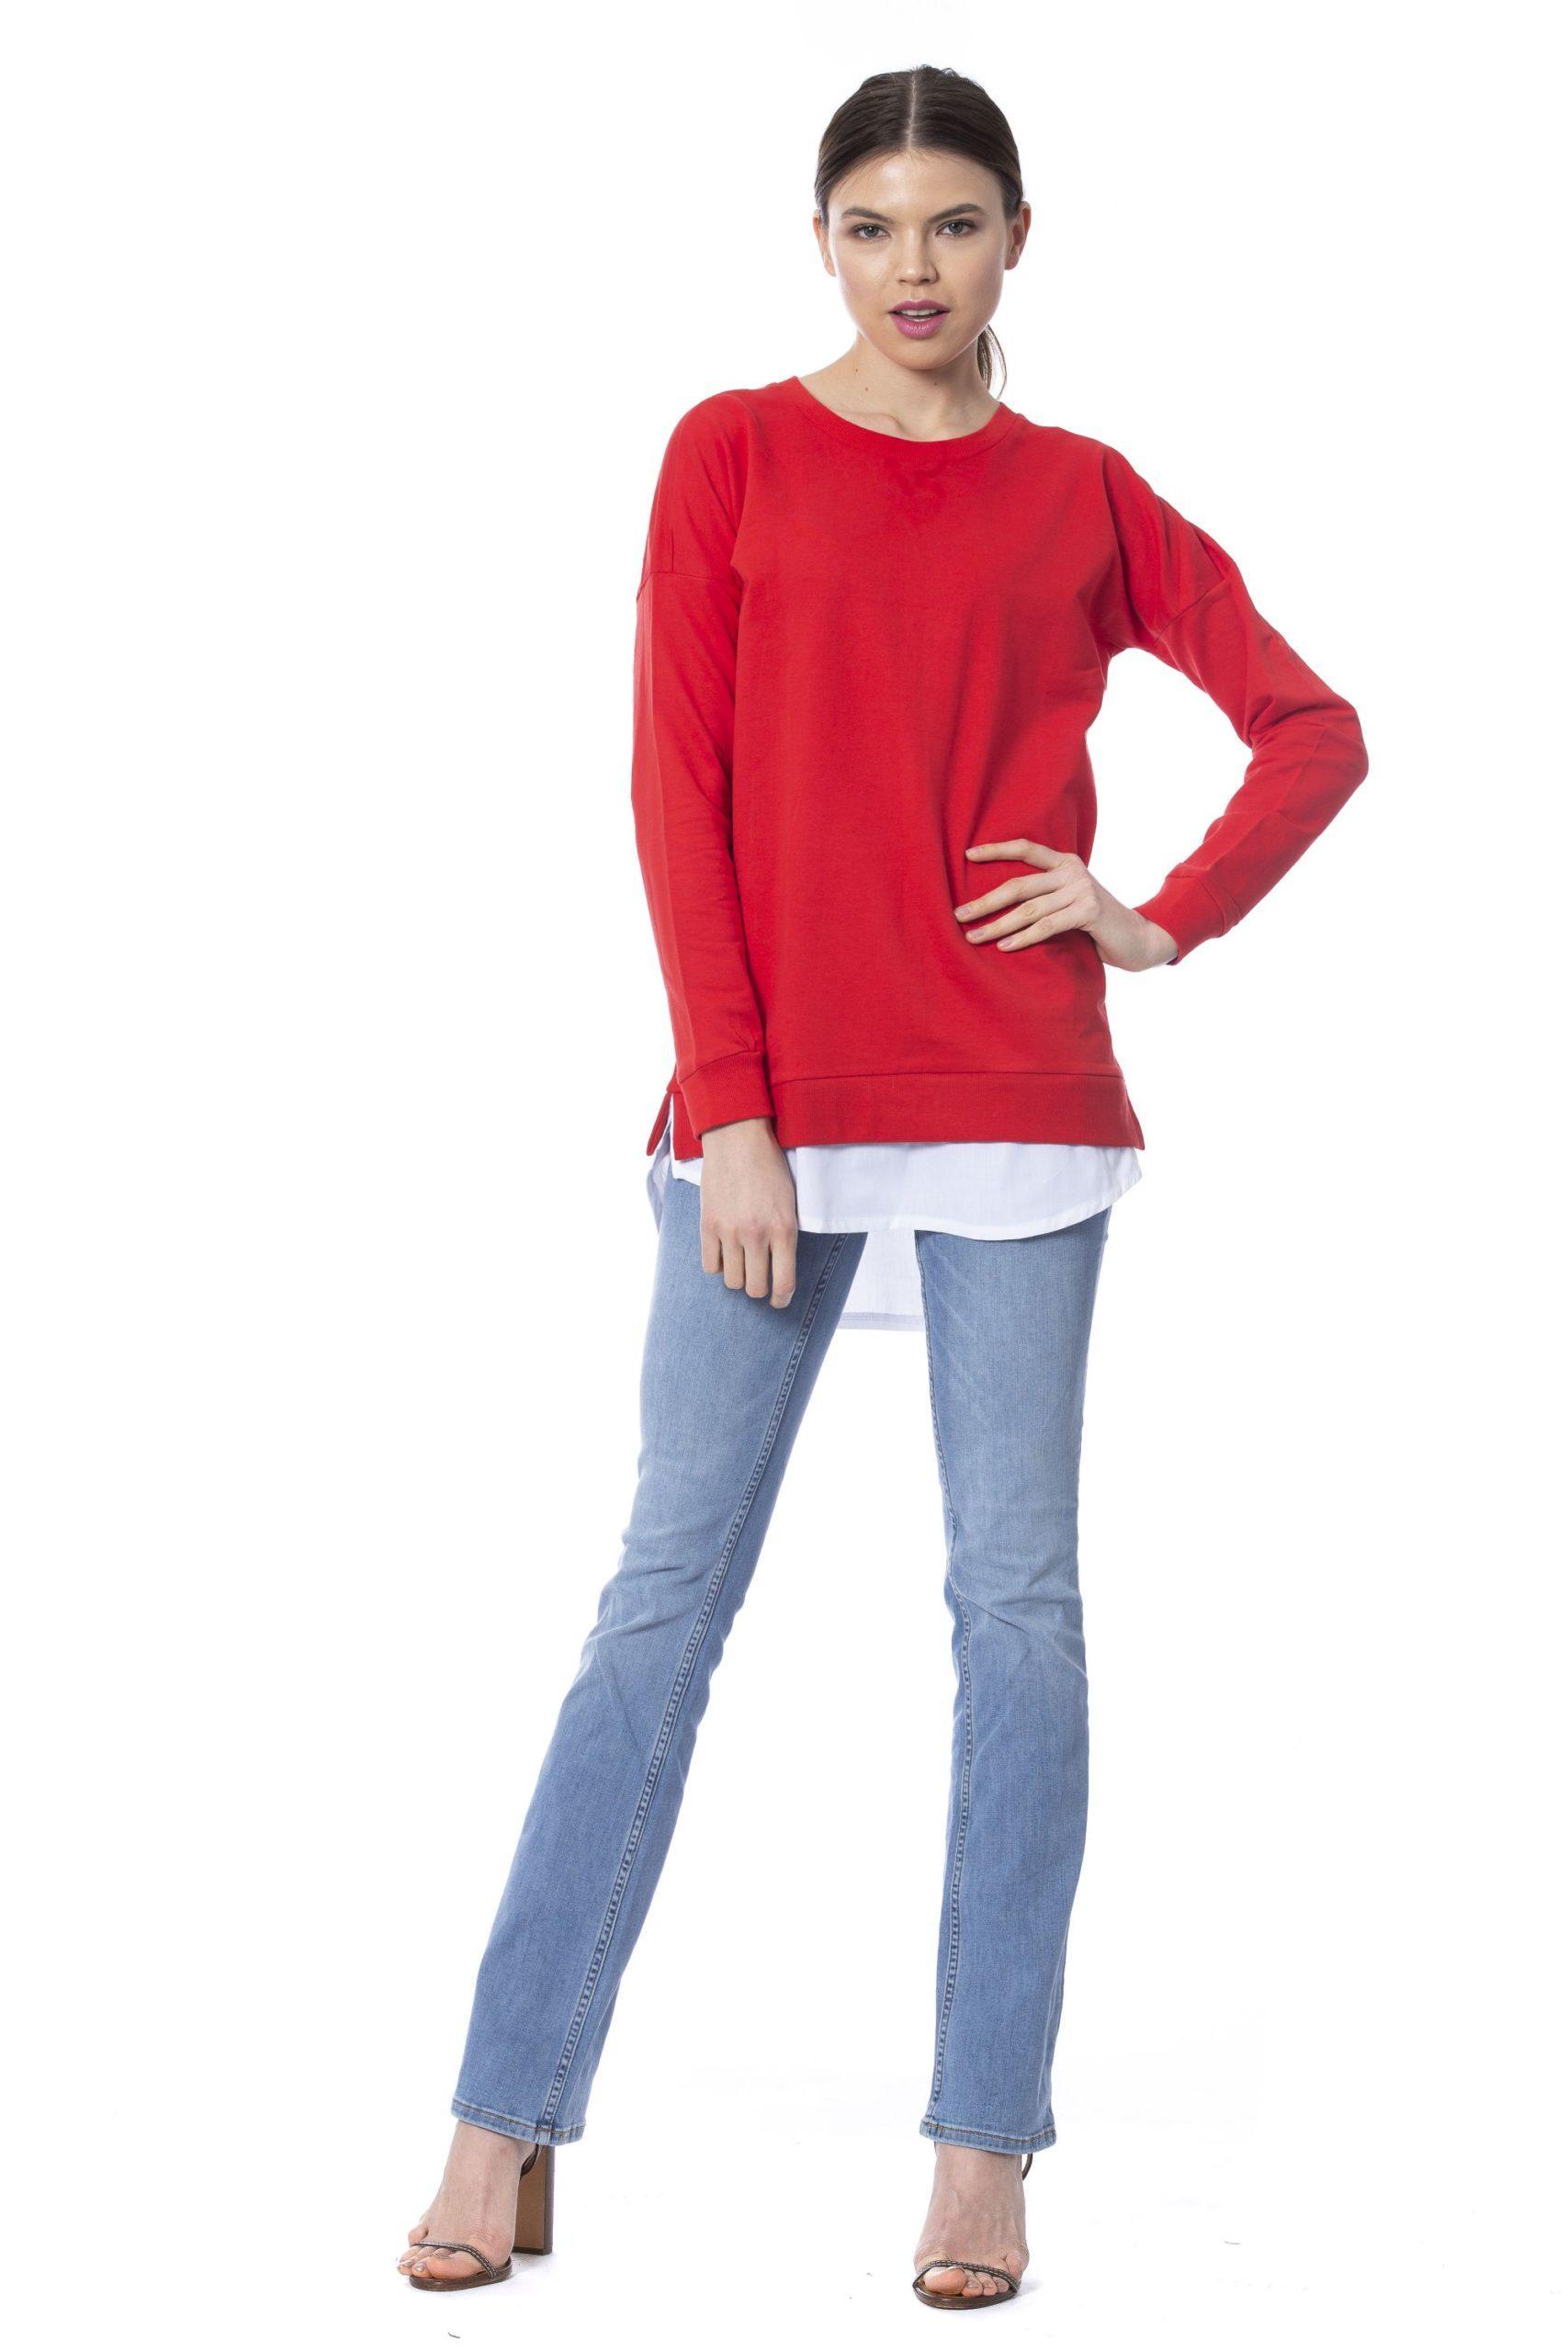 Silvian Heach Women's Watermelon Sweater Red SI1273315 - XS